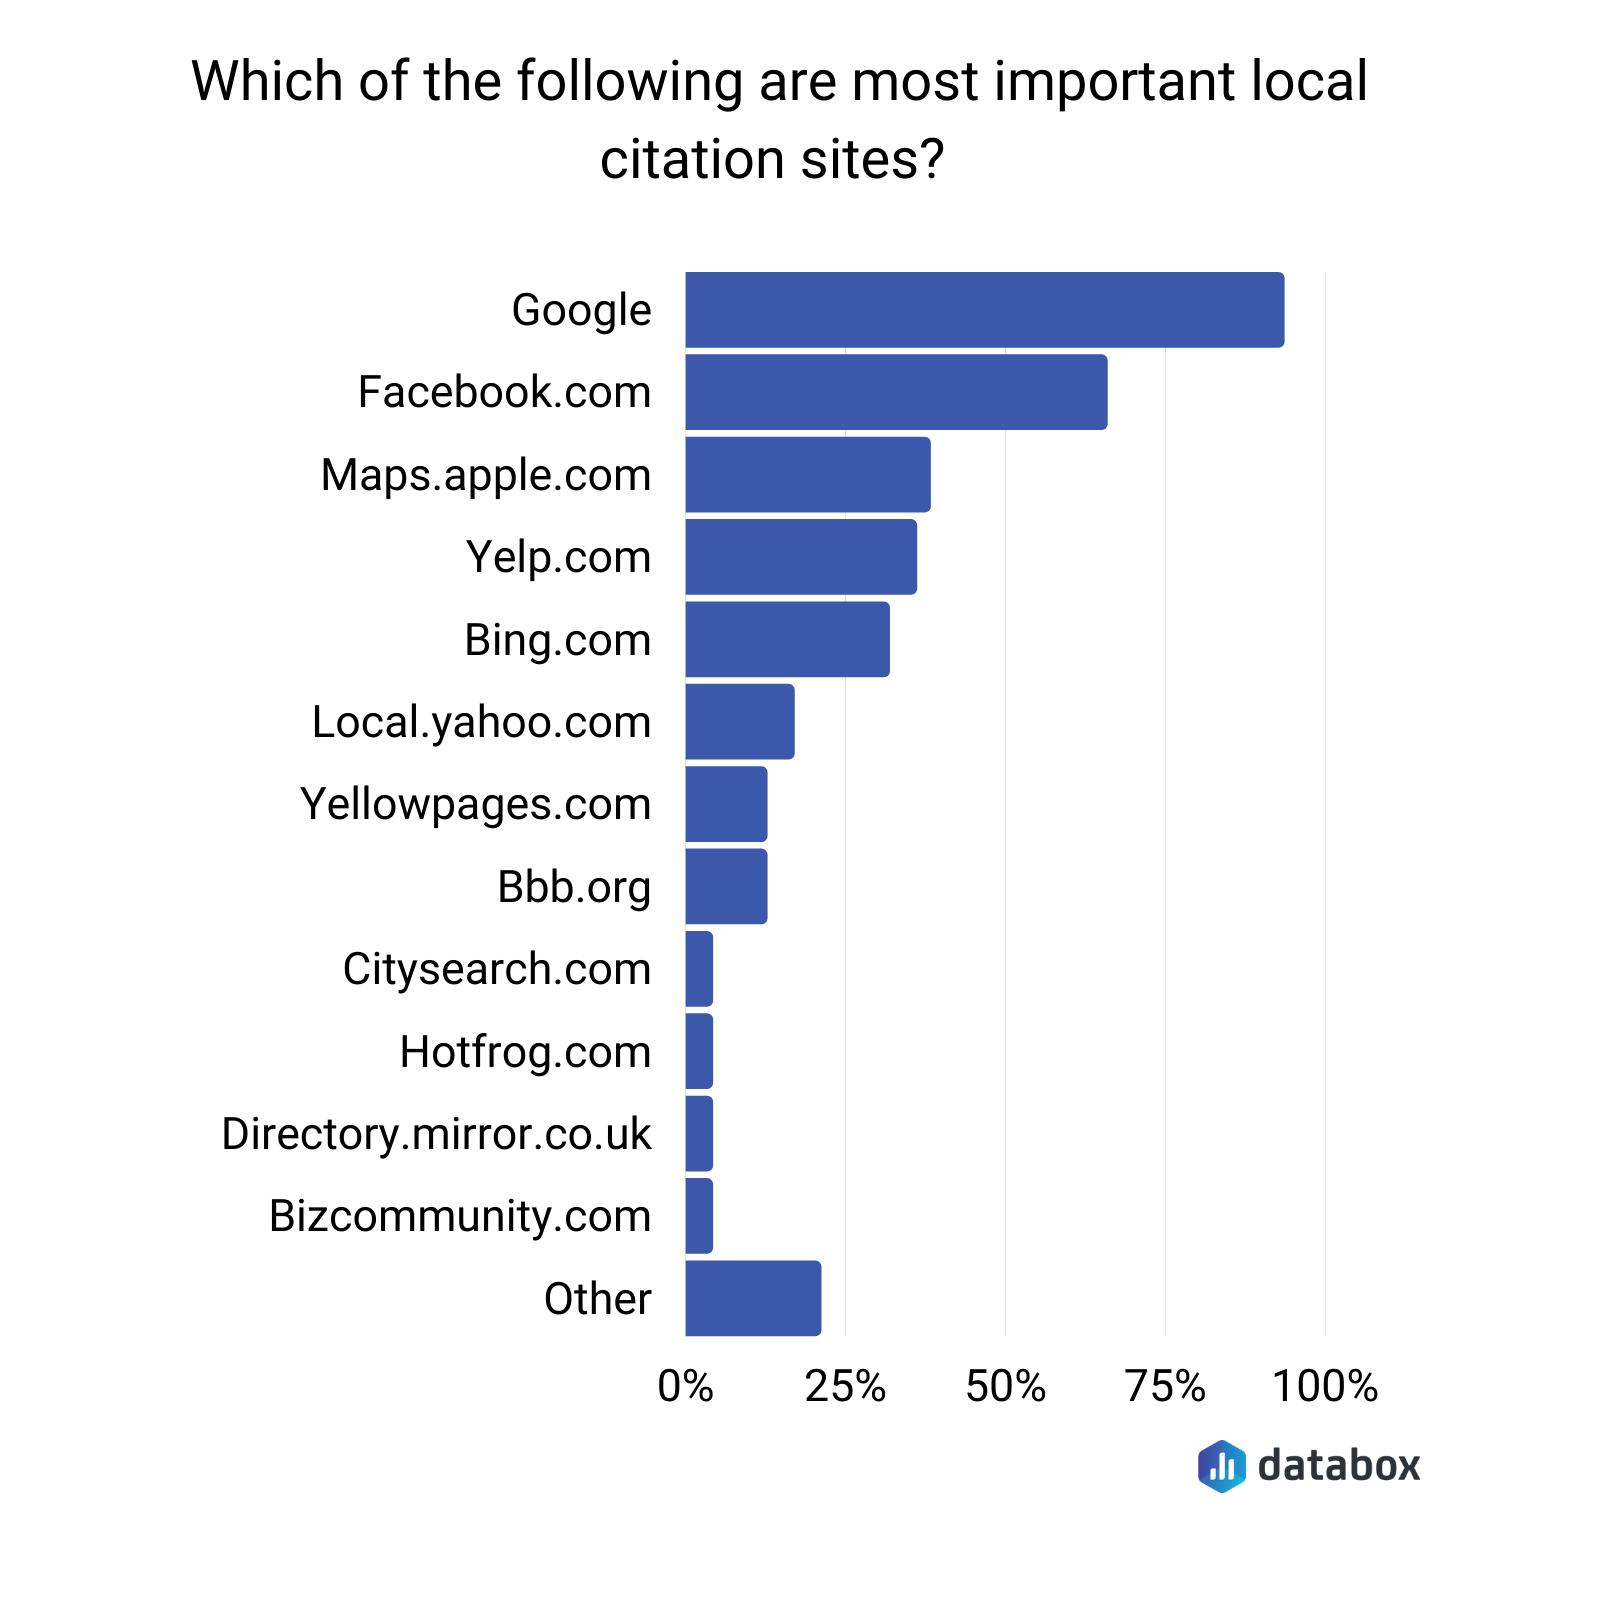 Most important local citation sites